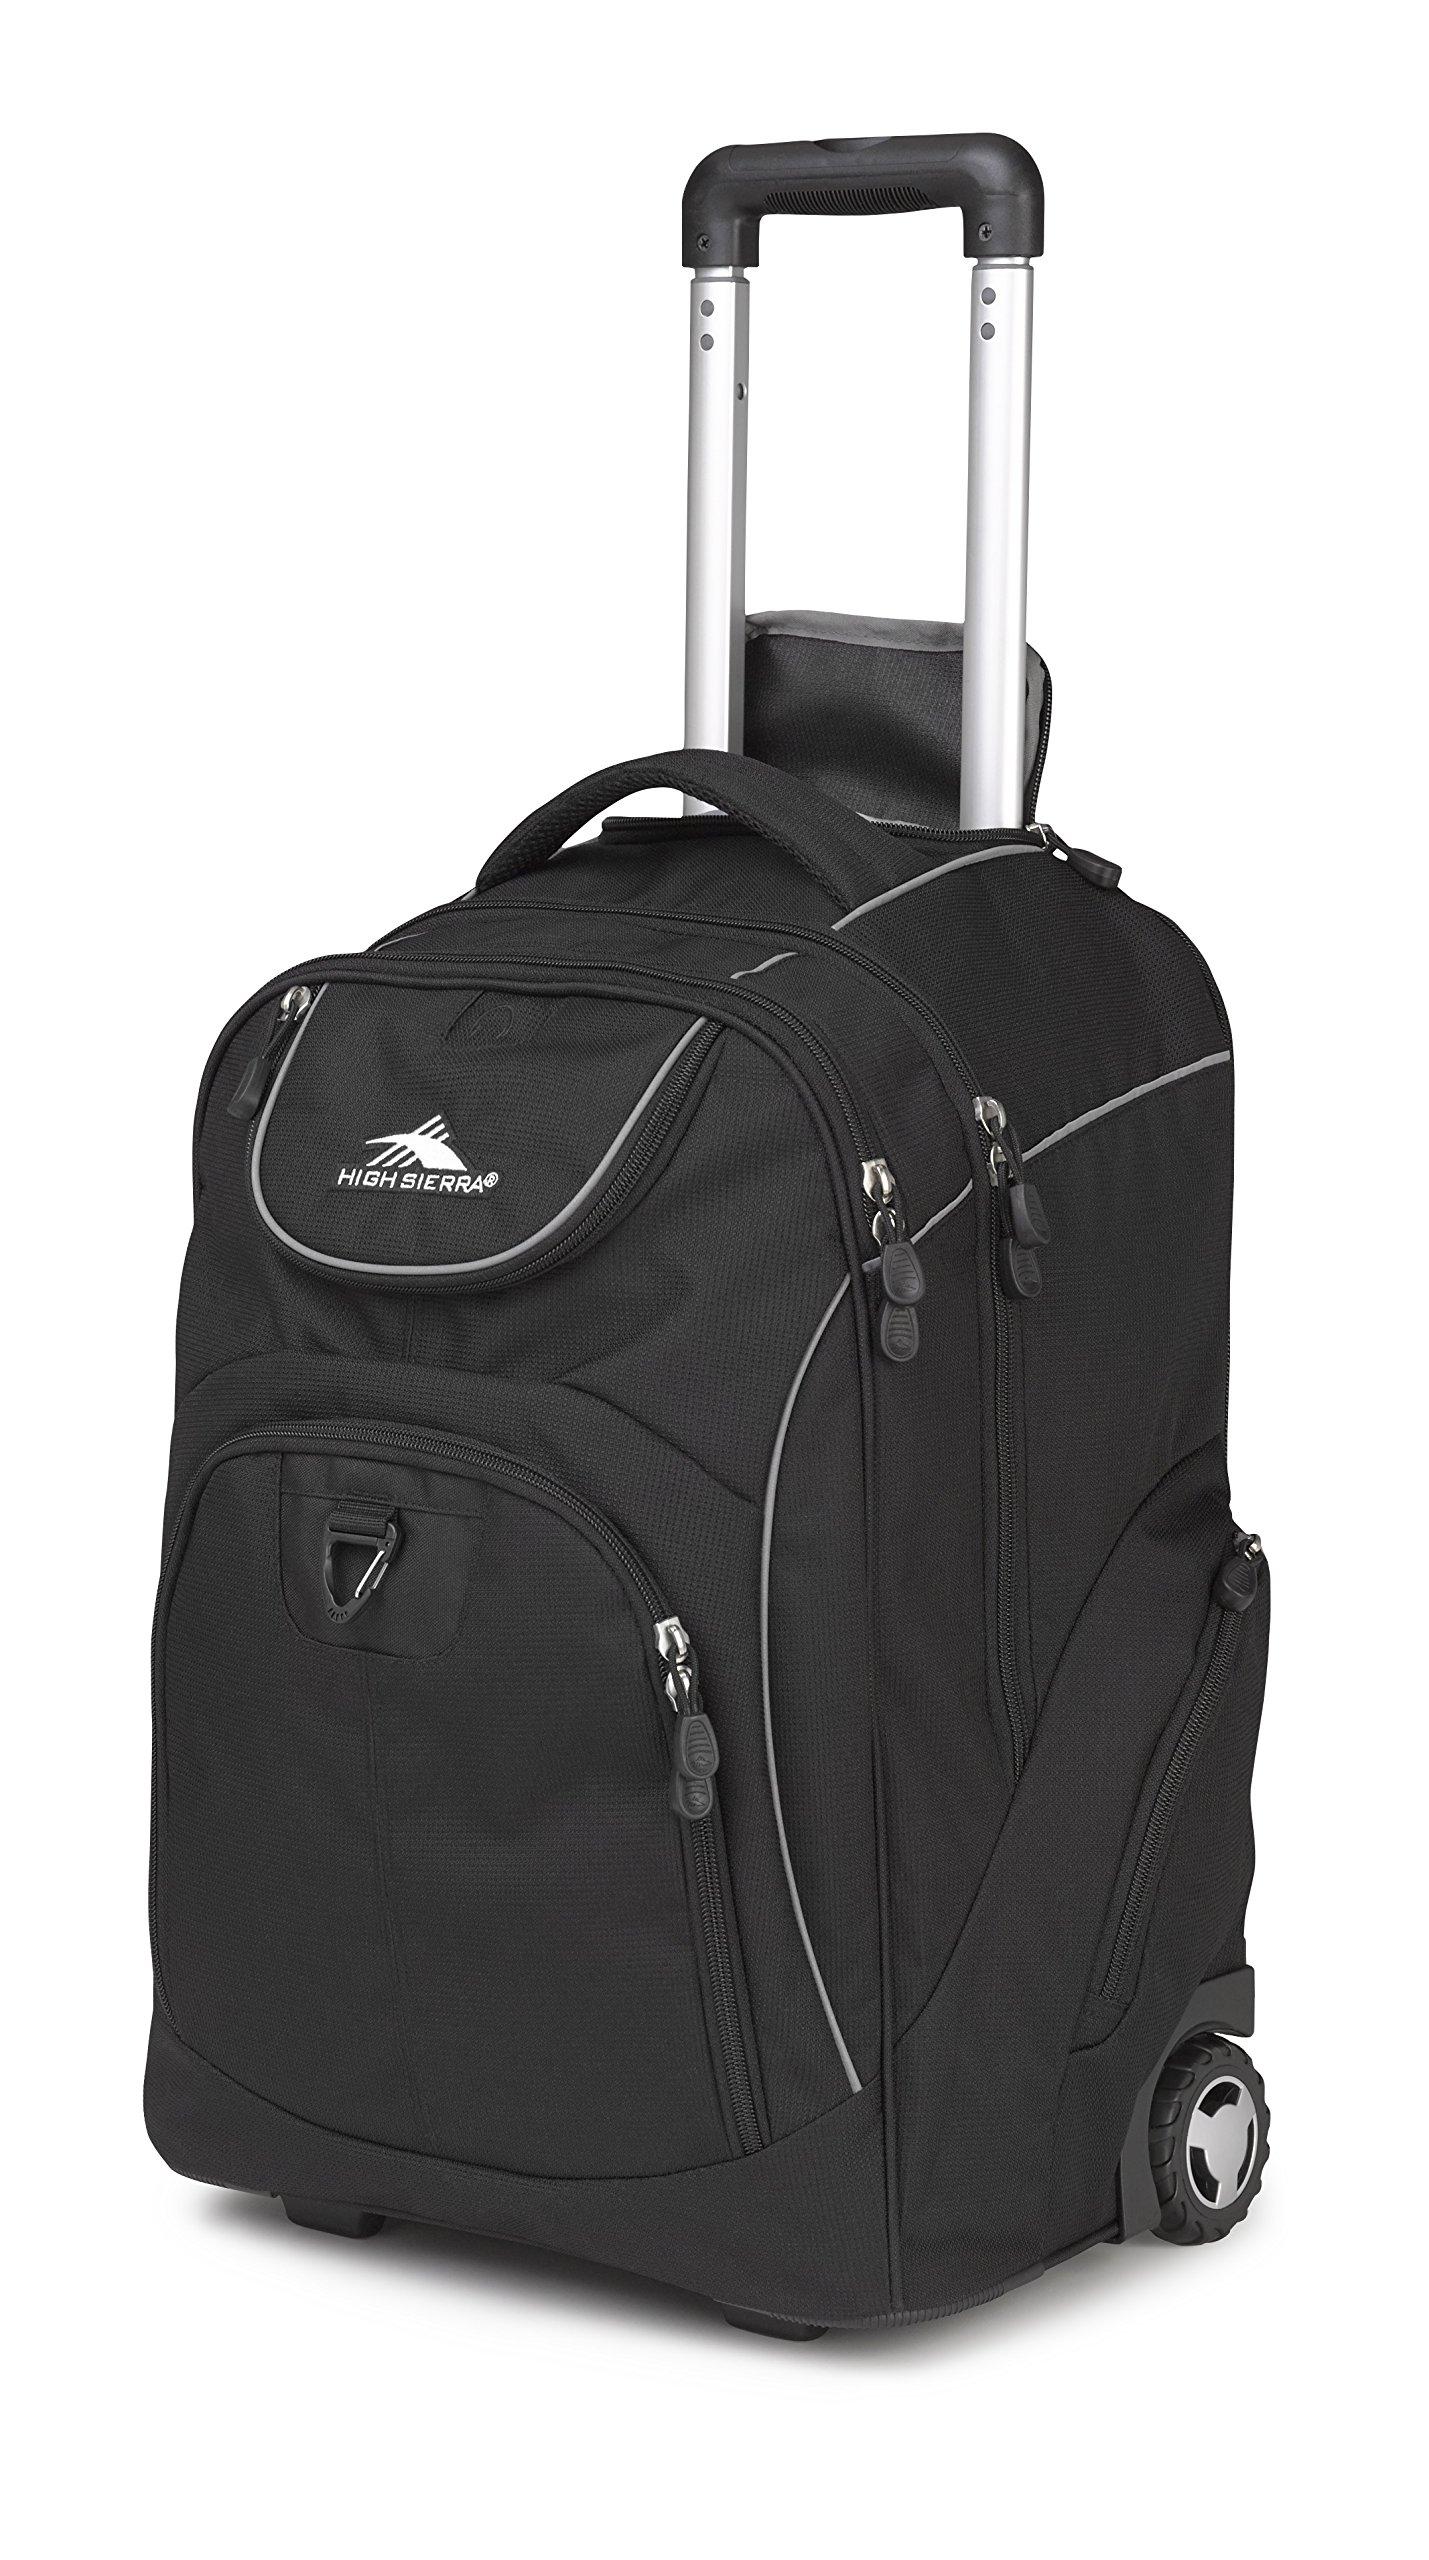 High Sierra Powerglide Wheeled Laptop Backpack, Black (Black, Black)